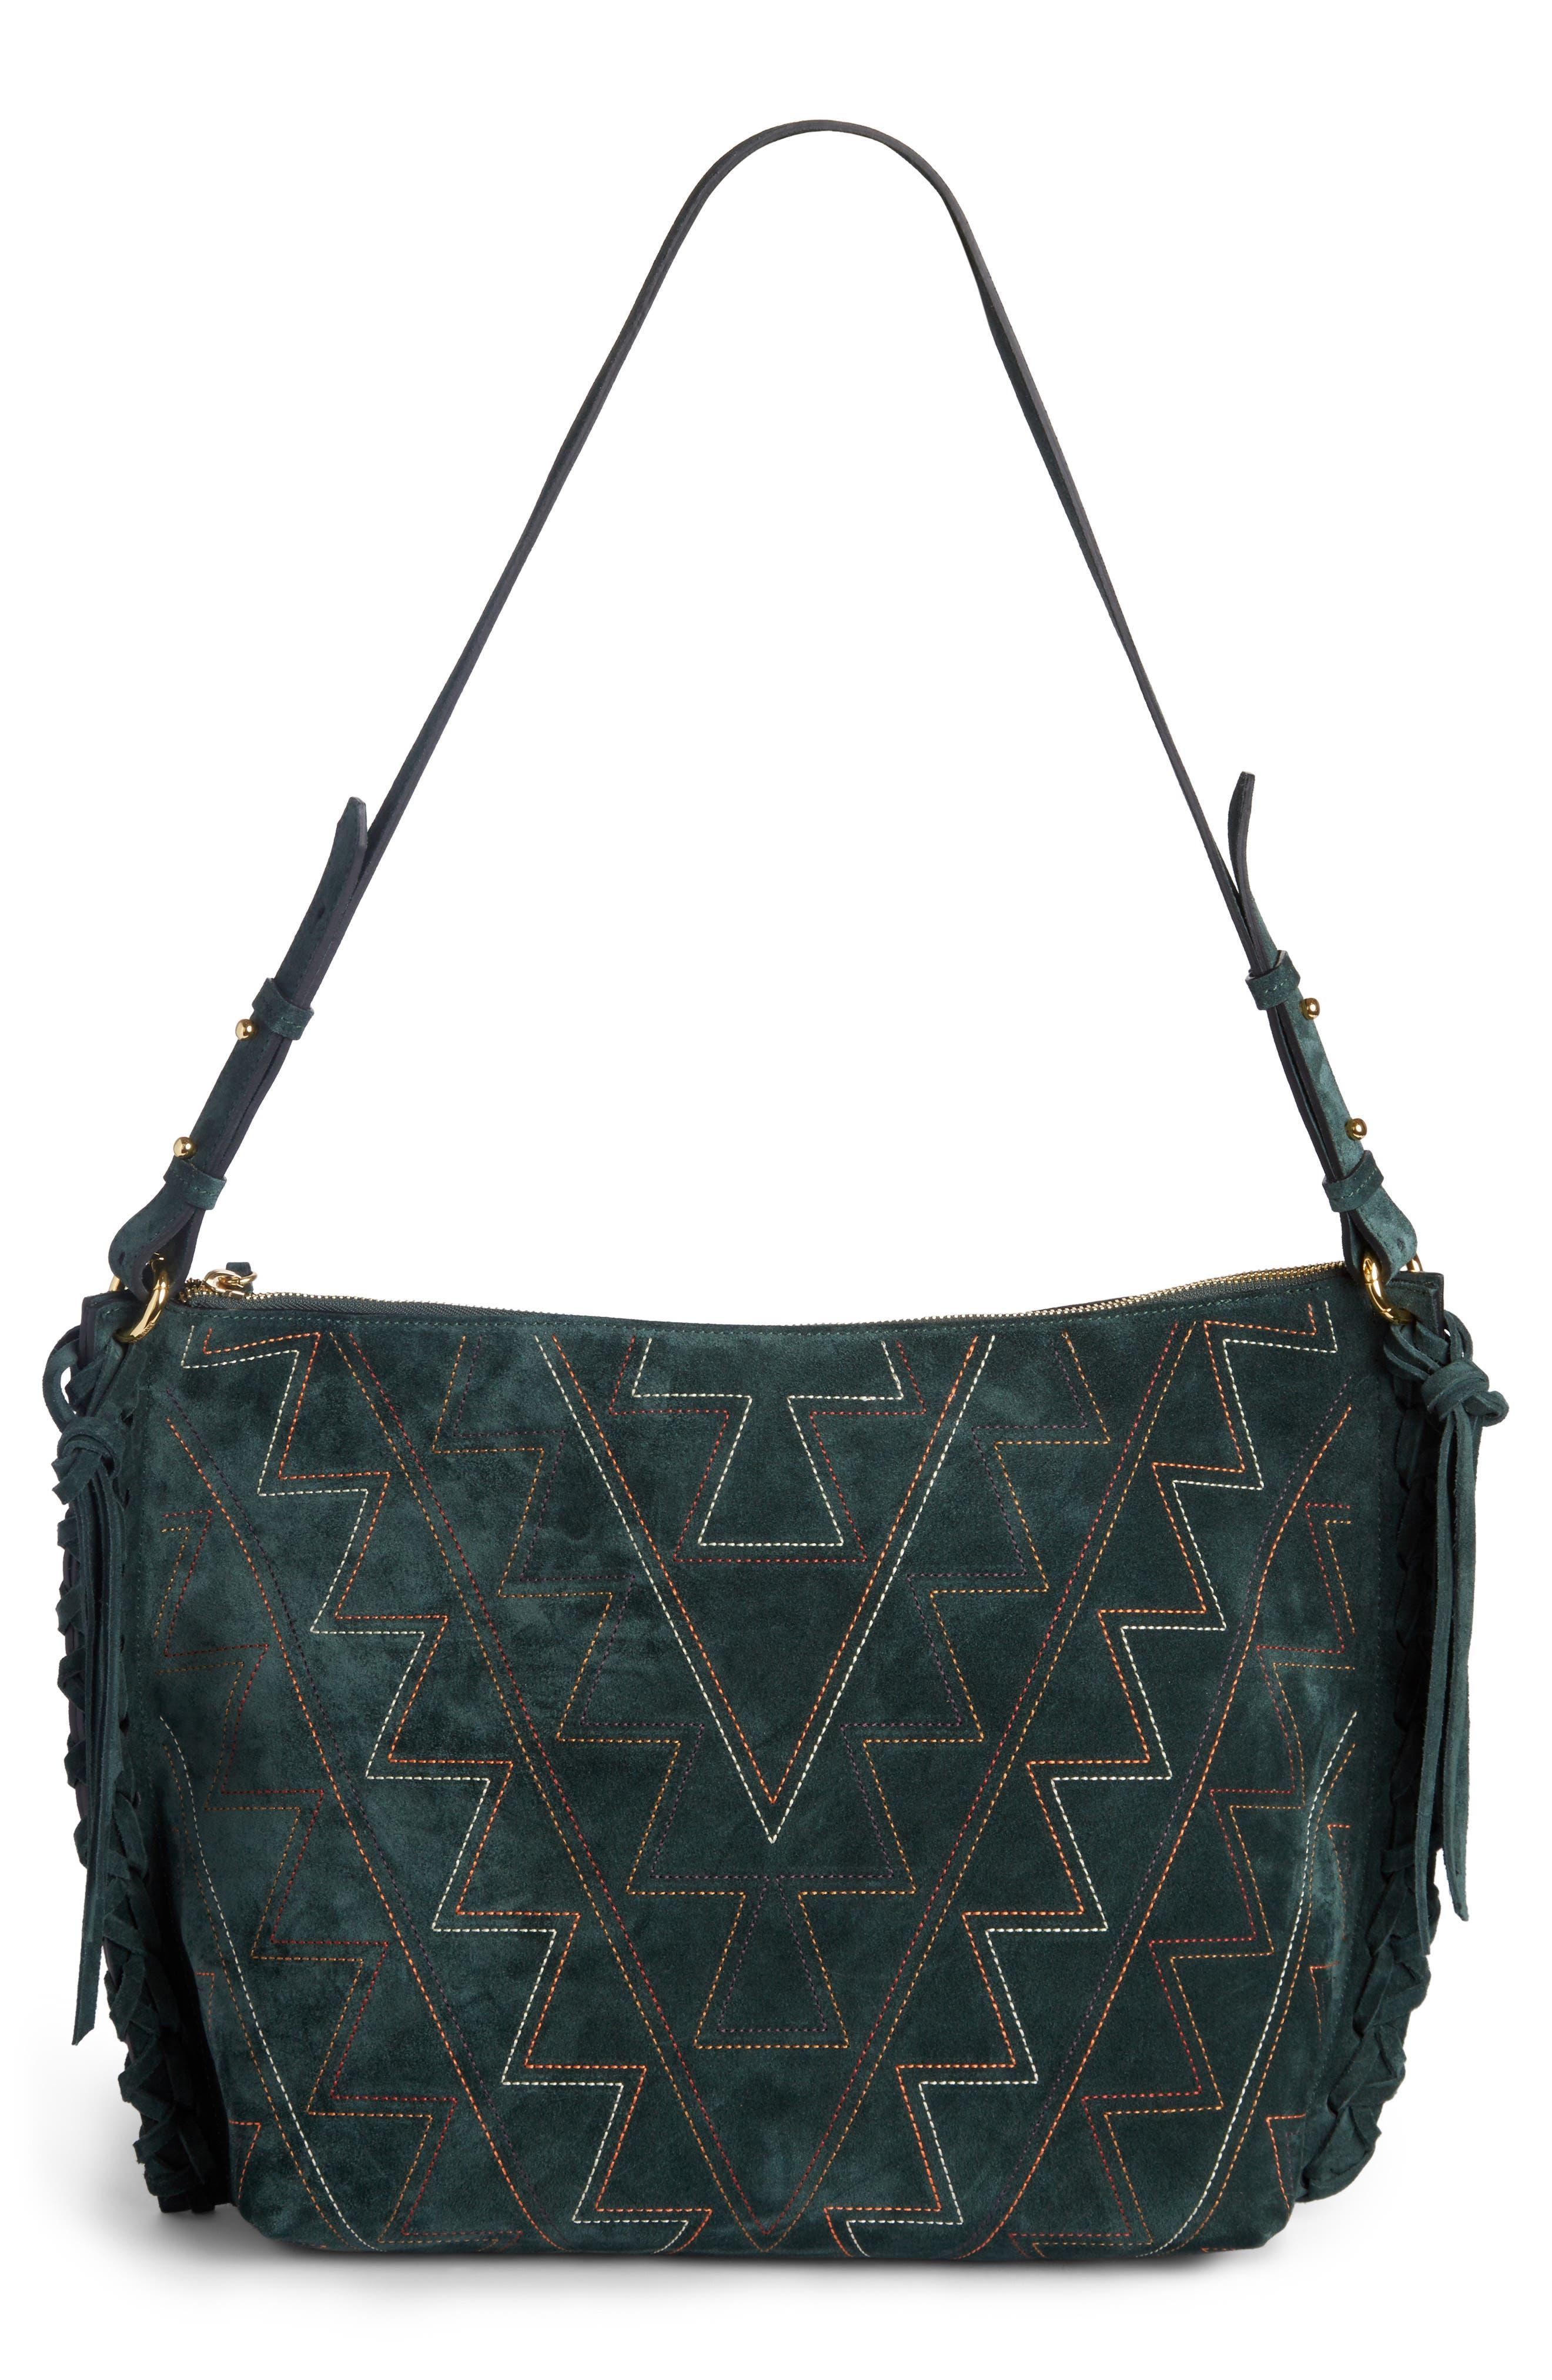 Osun Stitched Suede Shoulder Bag,                             Alternate thumbnail 2, color,                             301